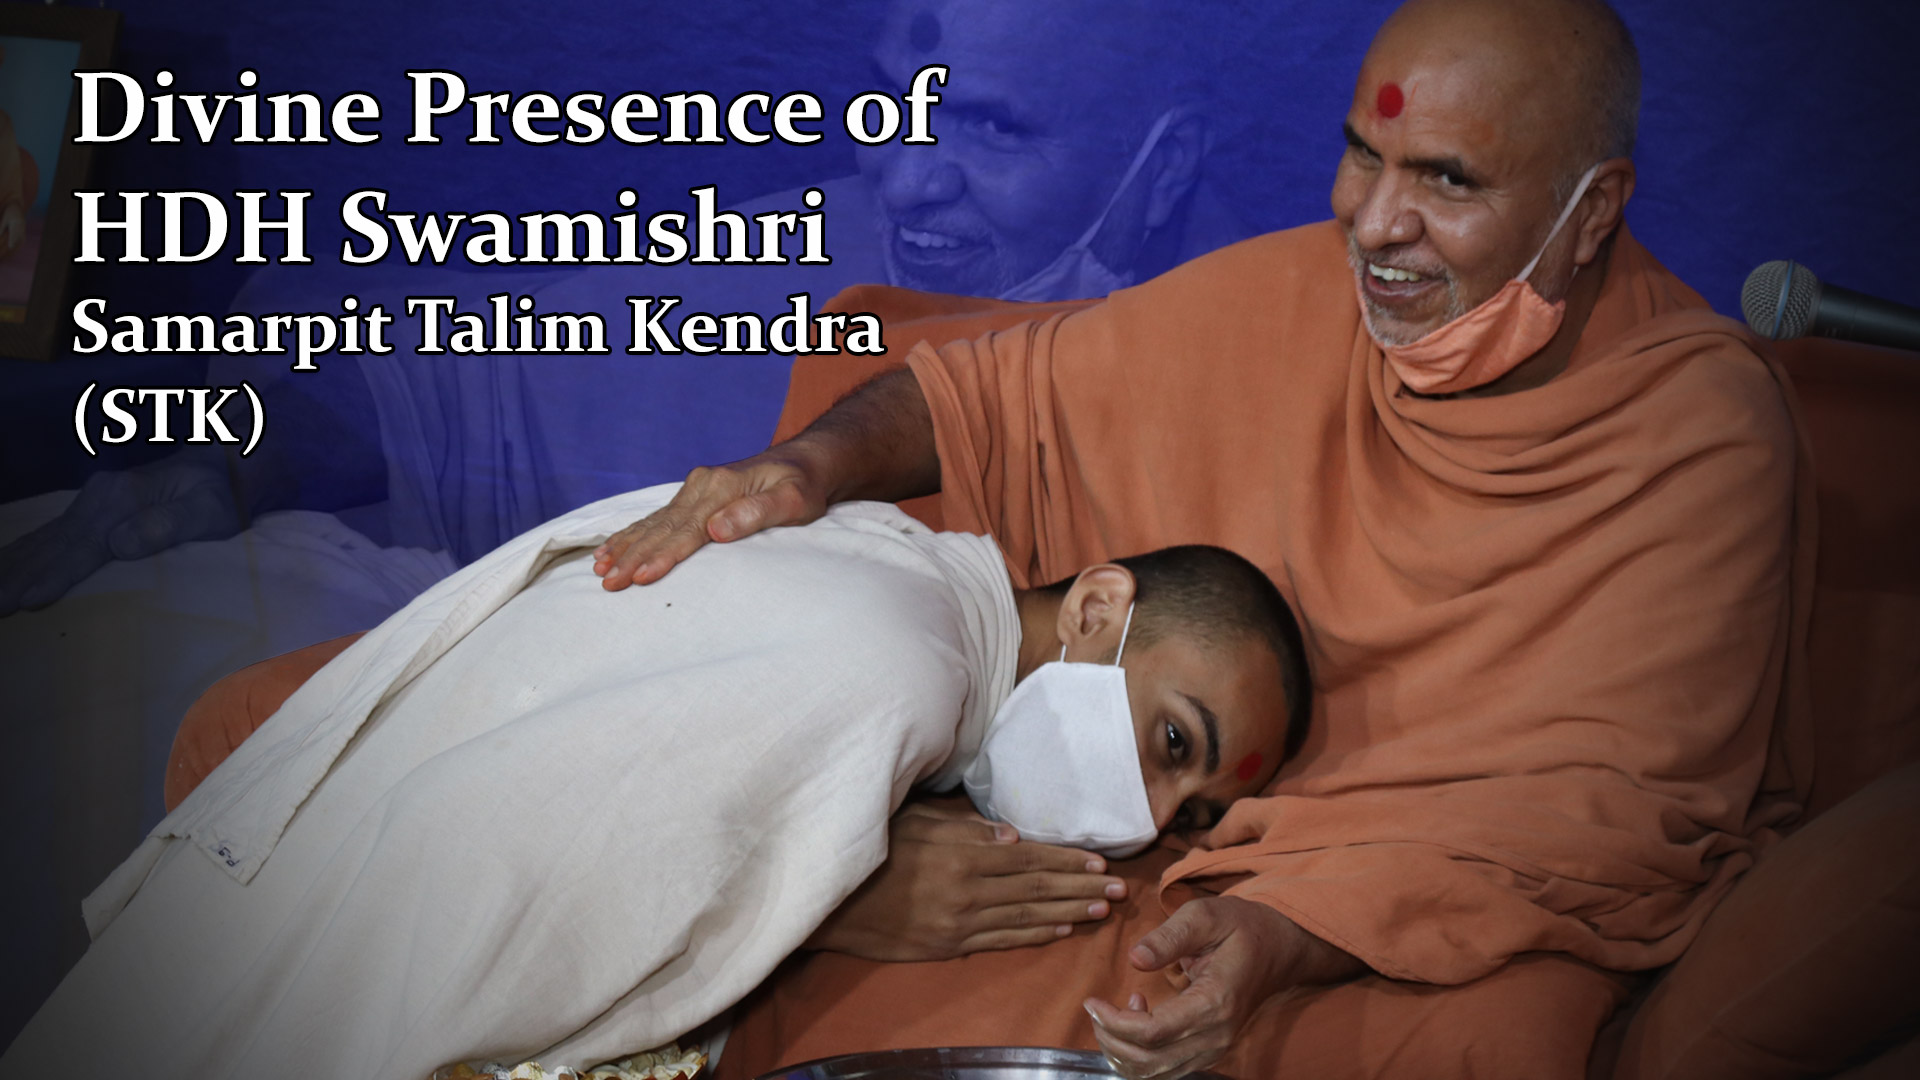 HDH Swamishri Vicharan | Divine Presence of HDH Swamishri - STK